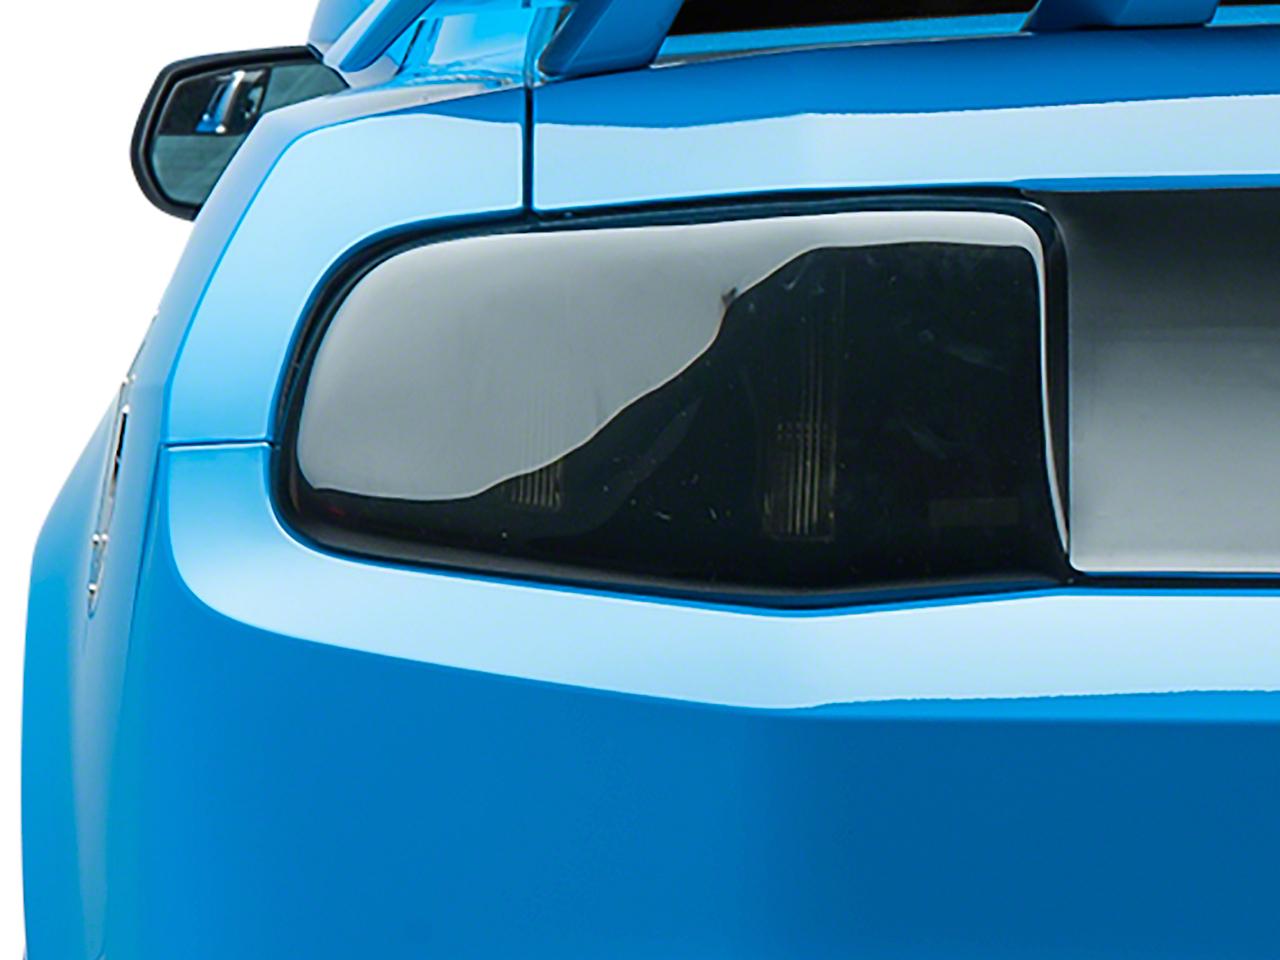 SpeedForm Smoked Tail Light Covers (10-12 All)